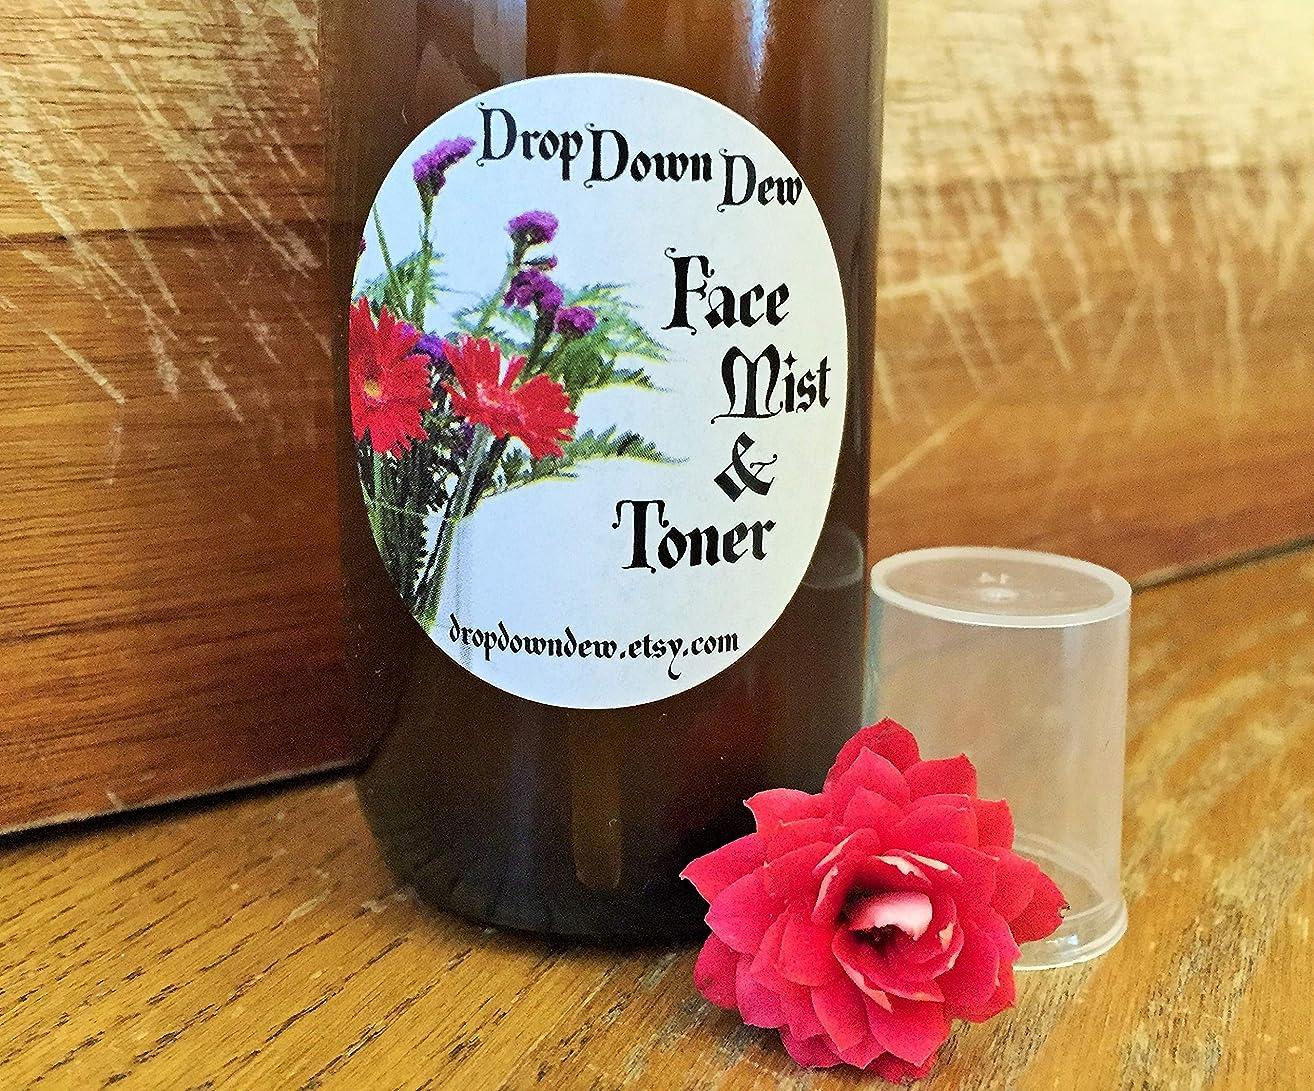 Face Mist, Toner, Body Spray, Botanical, Essential Oils, Rose Water, Green Tea, 2 oz. Glass Spray Bottle